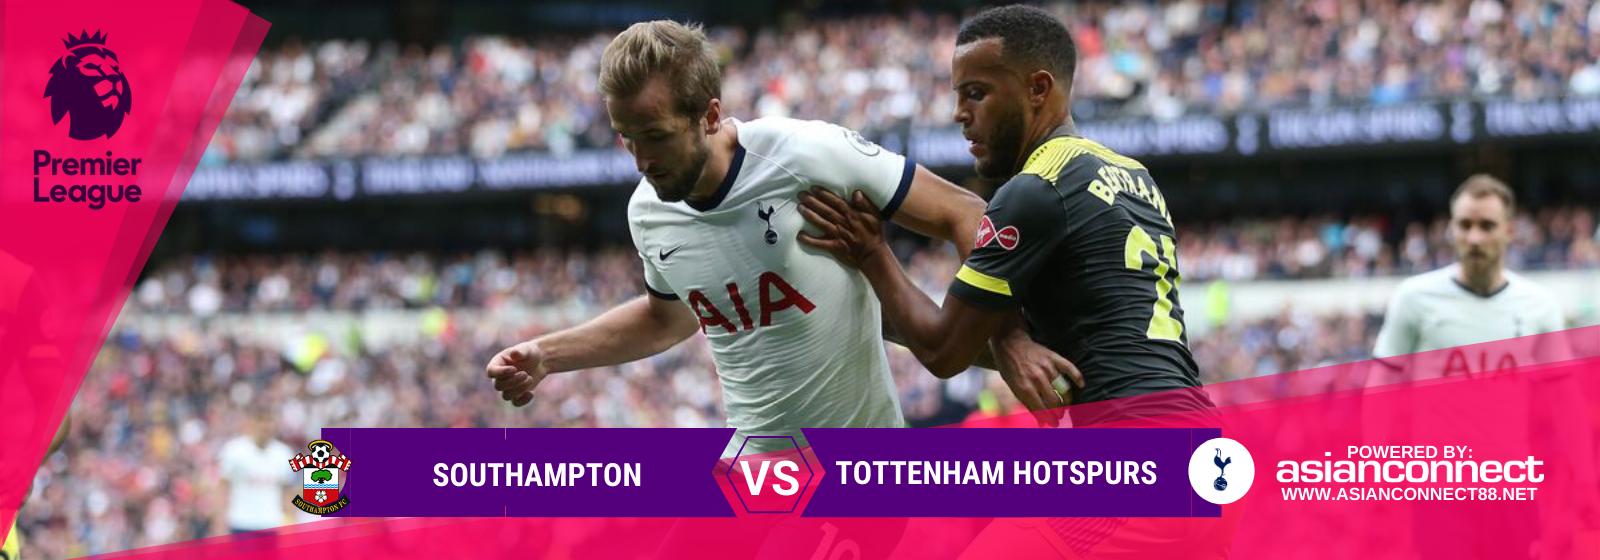 Asianconnect: Southampton vs Tottenham Hotspurs